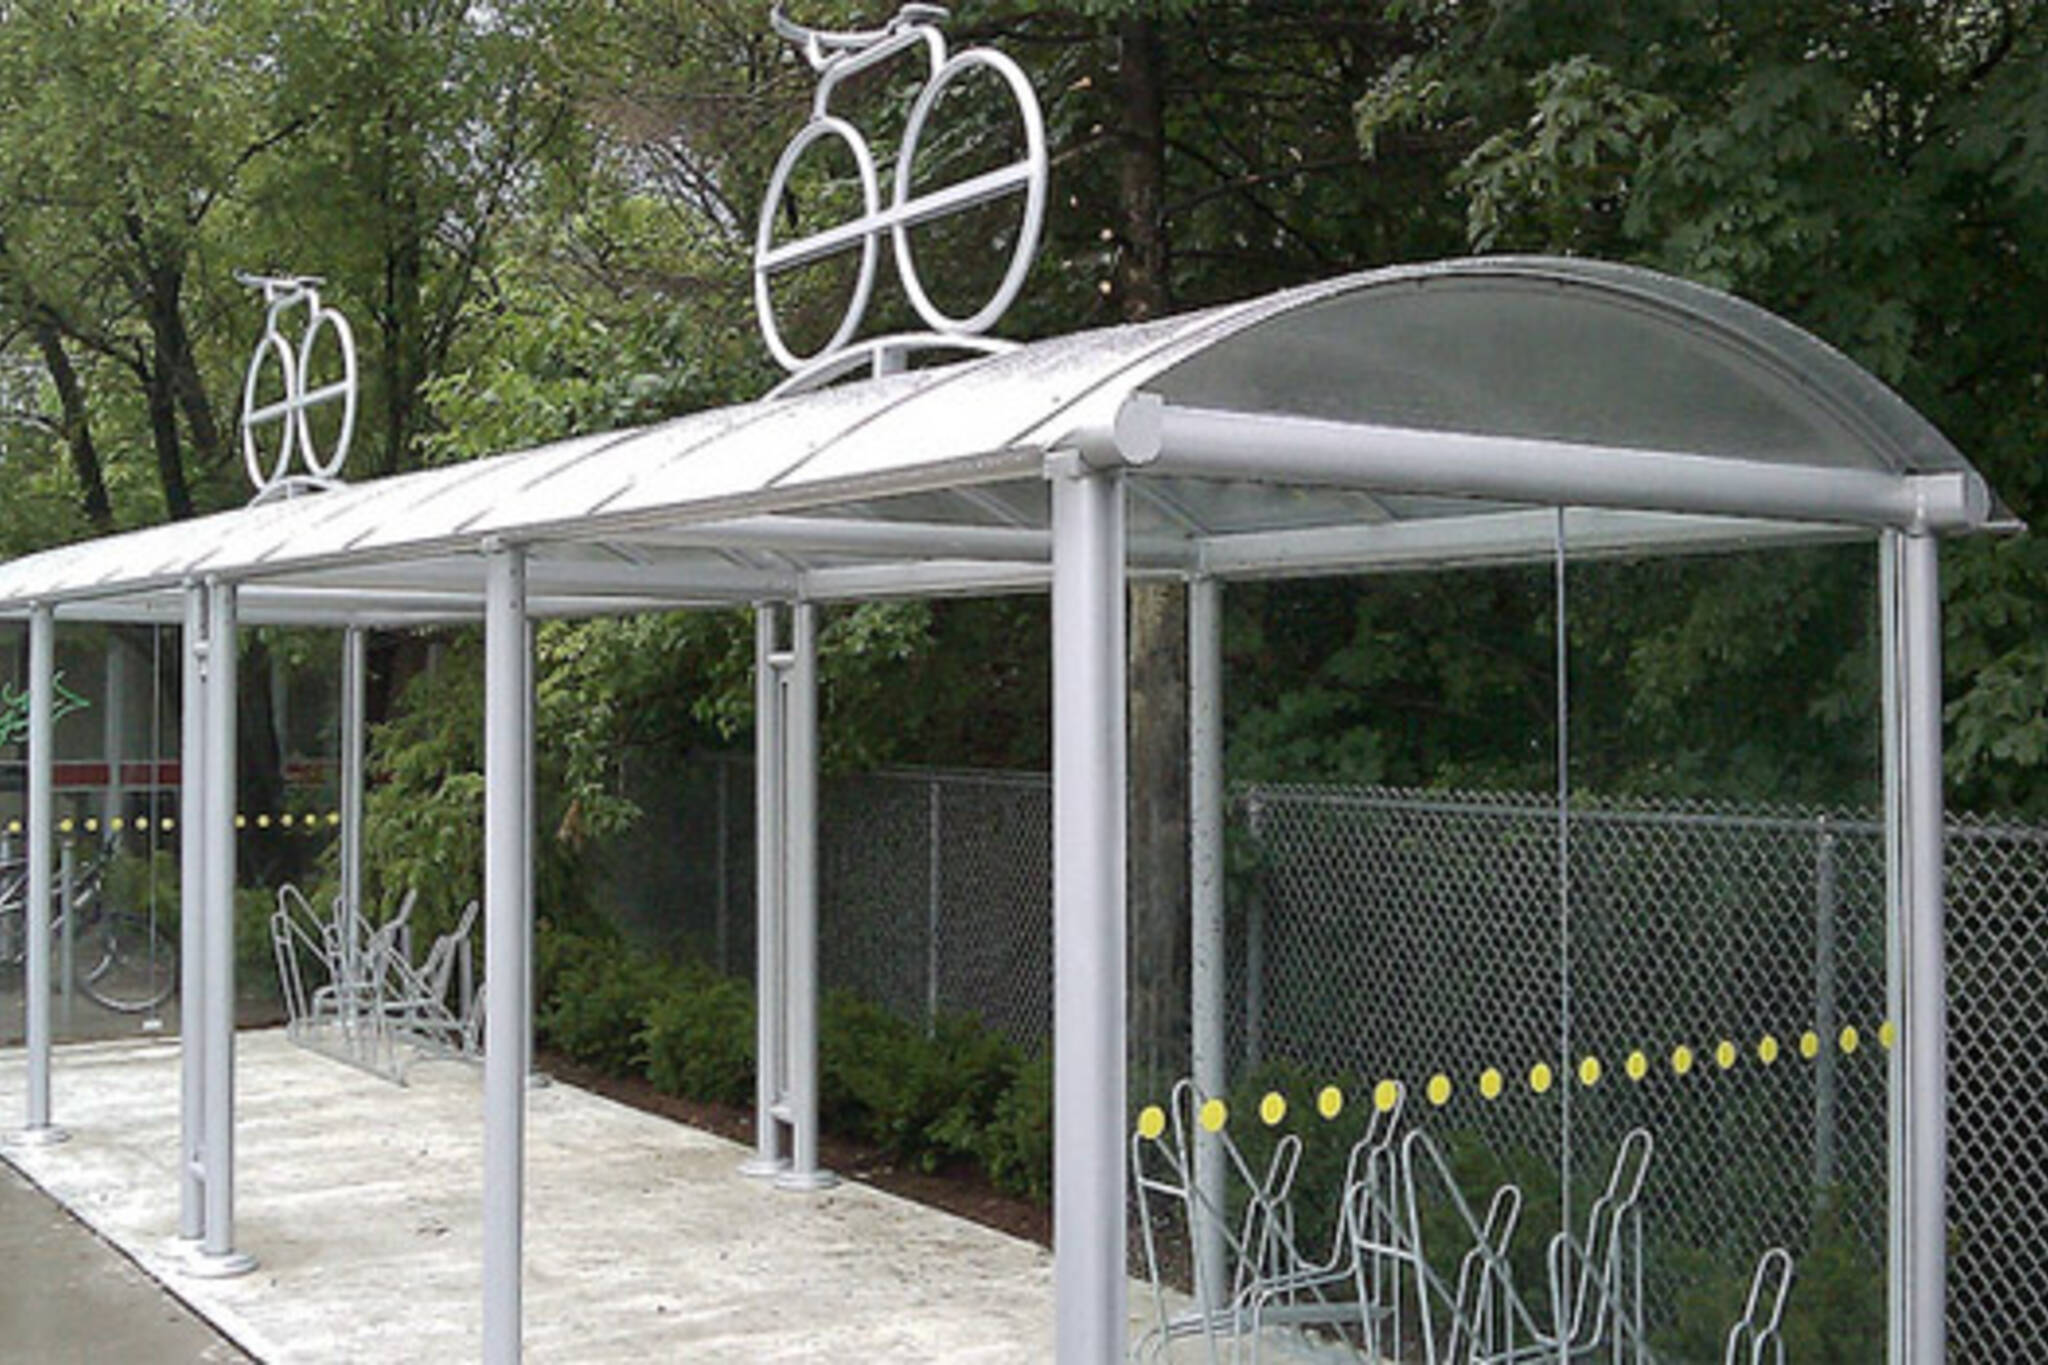 ttc bike shelter st.clair station